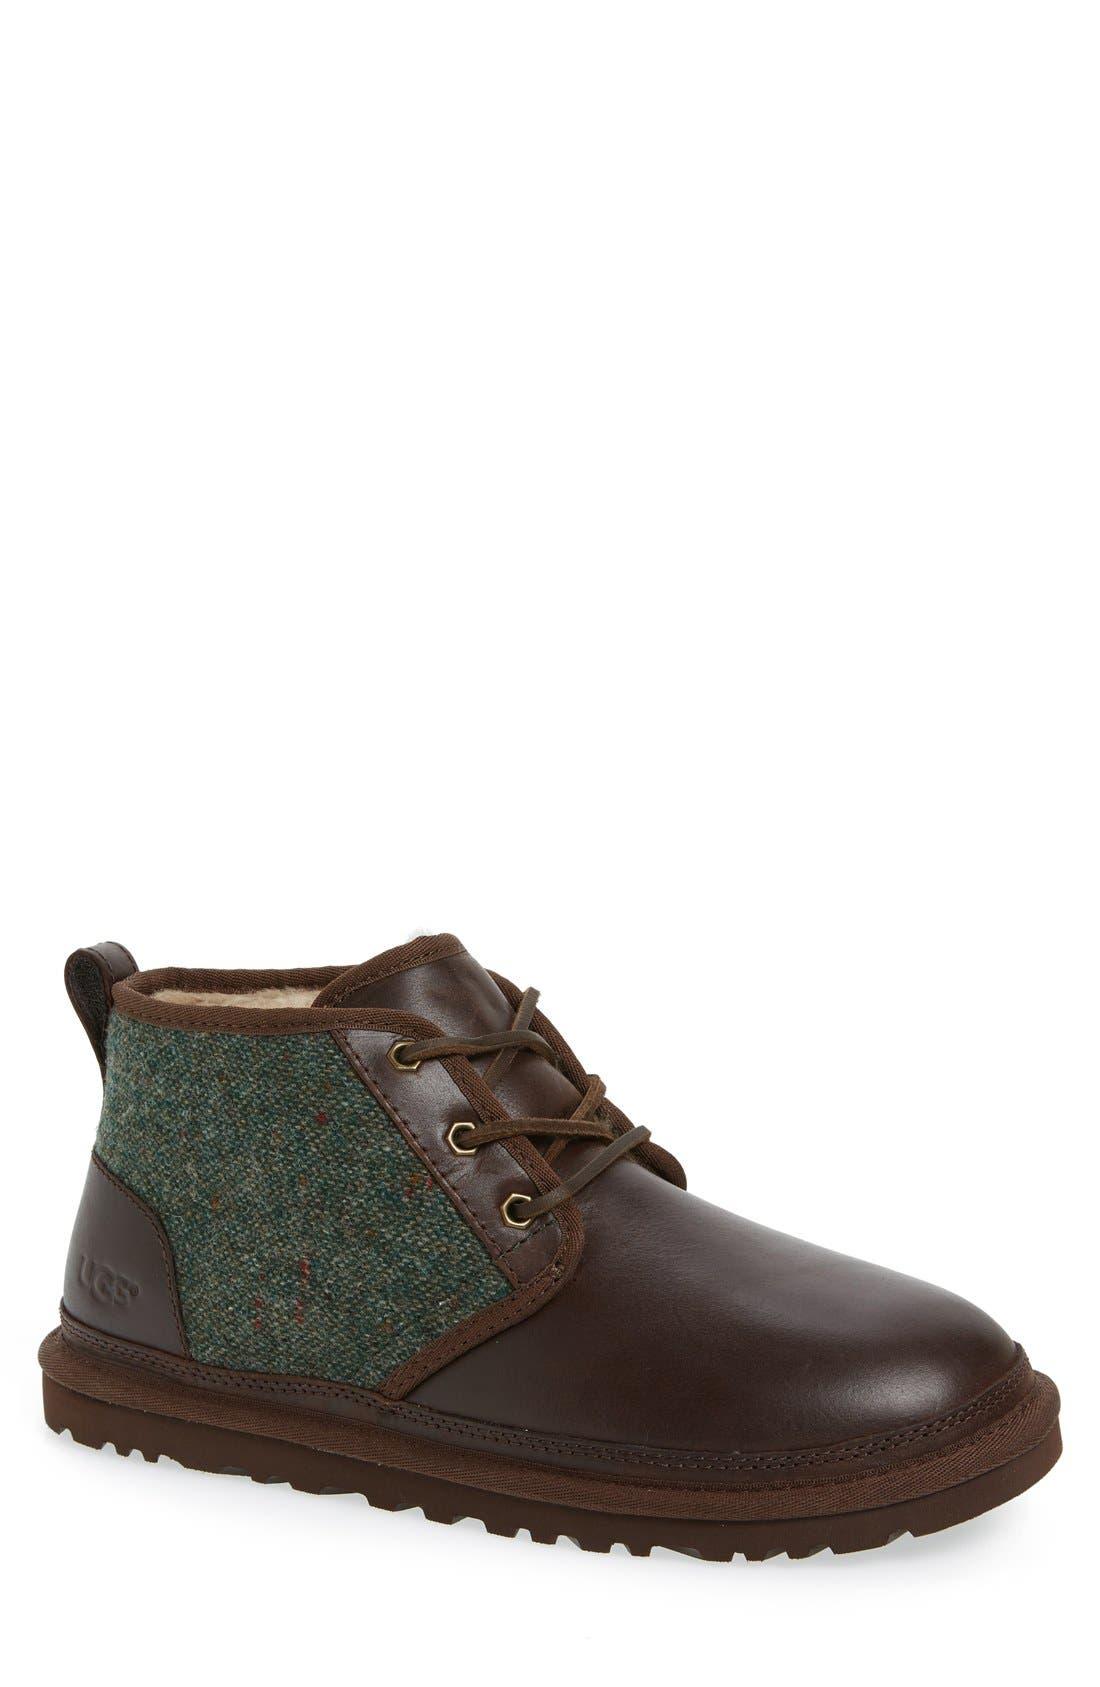 Neumel Wool & Leather Chukka Boot,                             Main thumbnail 1, color,                             207